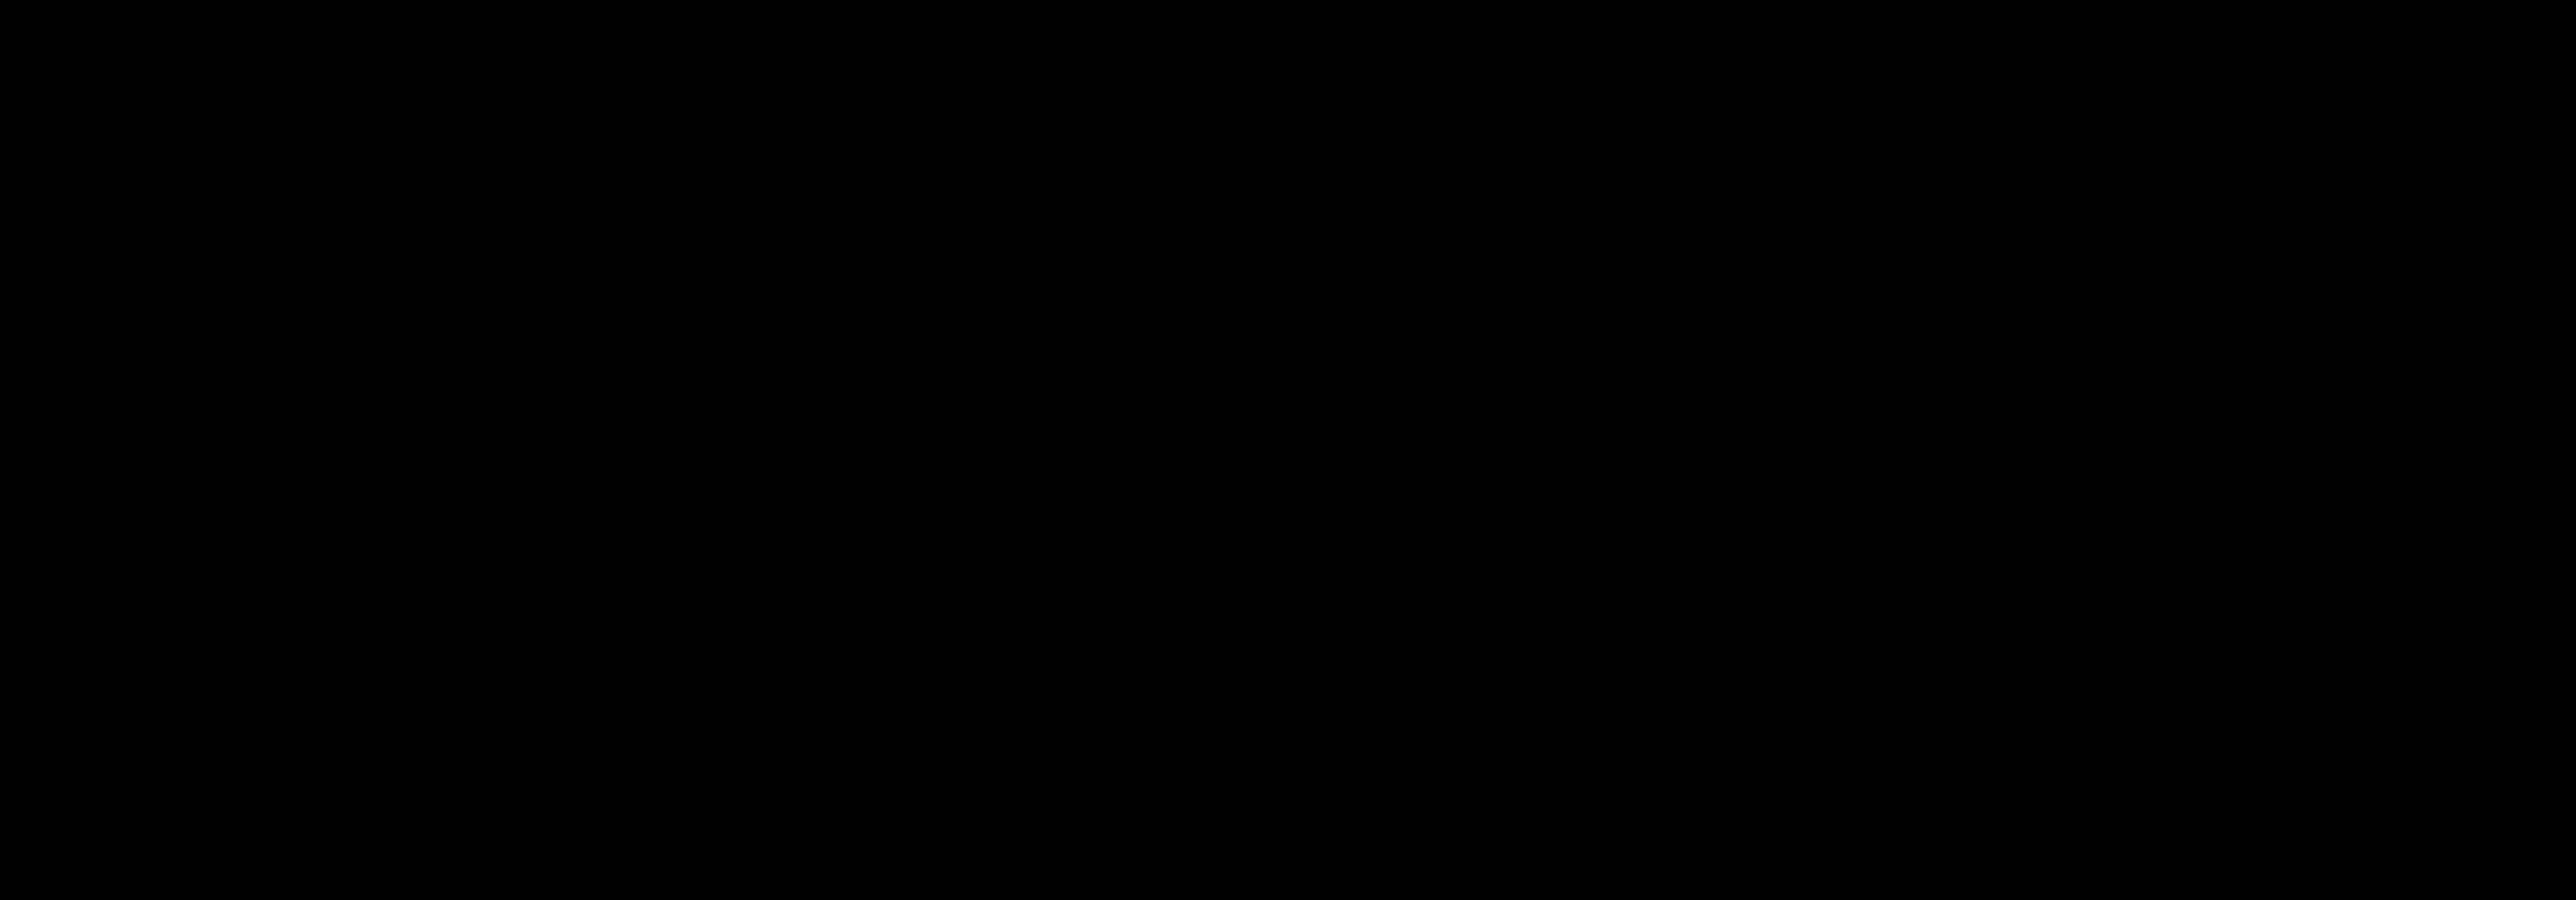 Variant – Commercial Trailer – 2018 P2 (399x180x103 cm)